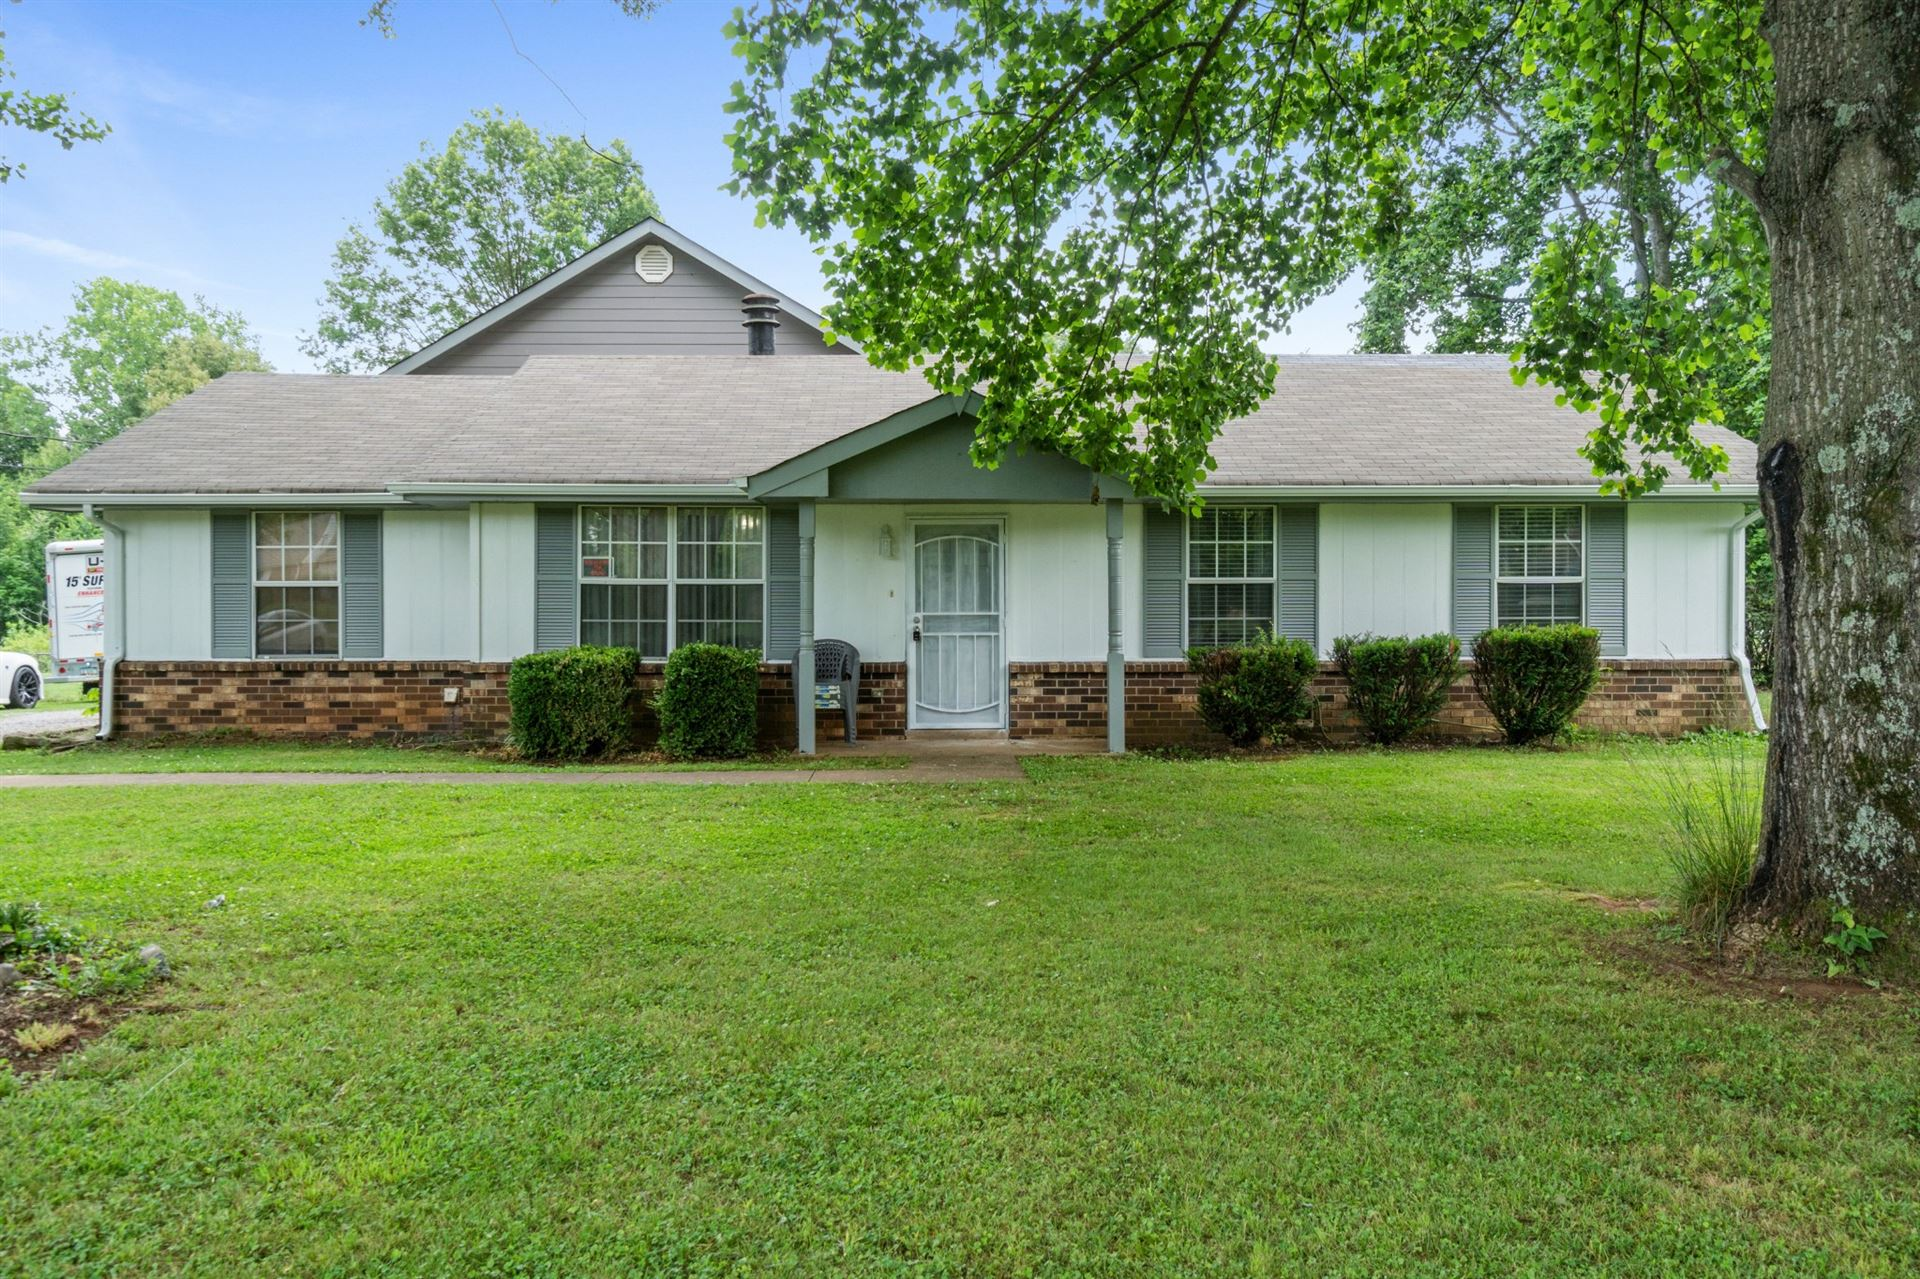 606 Lake Farm Rd, Smyrna, TN 37167 - MLS#: 2261335